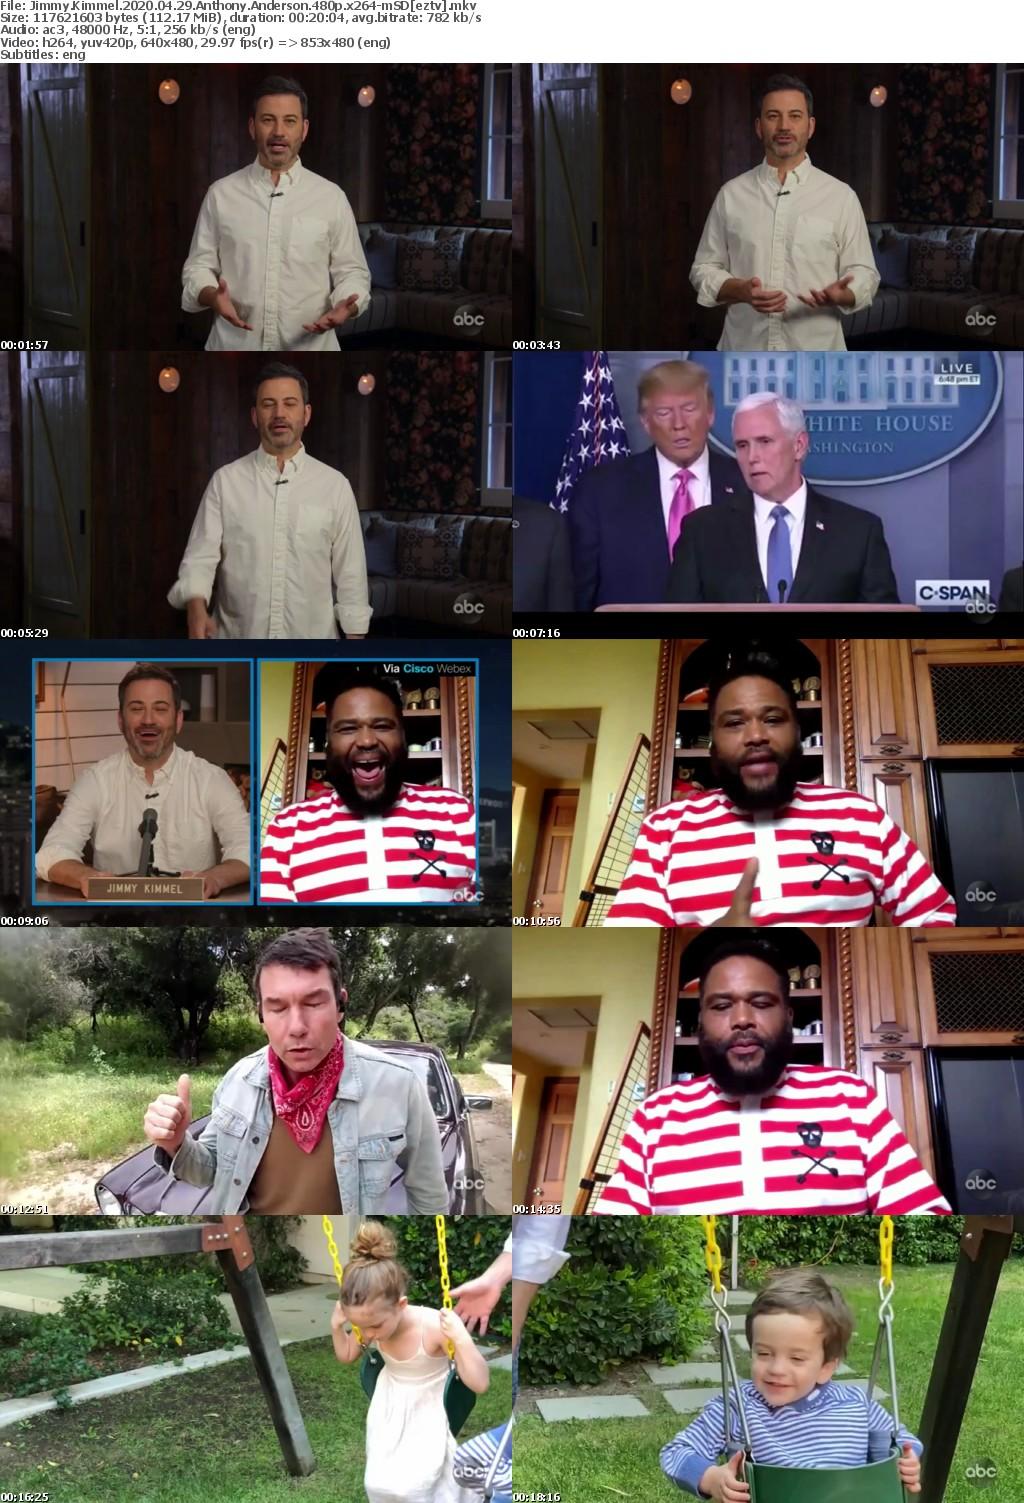 Jimmy Kimmel 2020 04 29 Anthony Anderson 480p x264-mSD